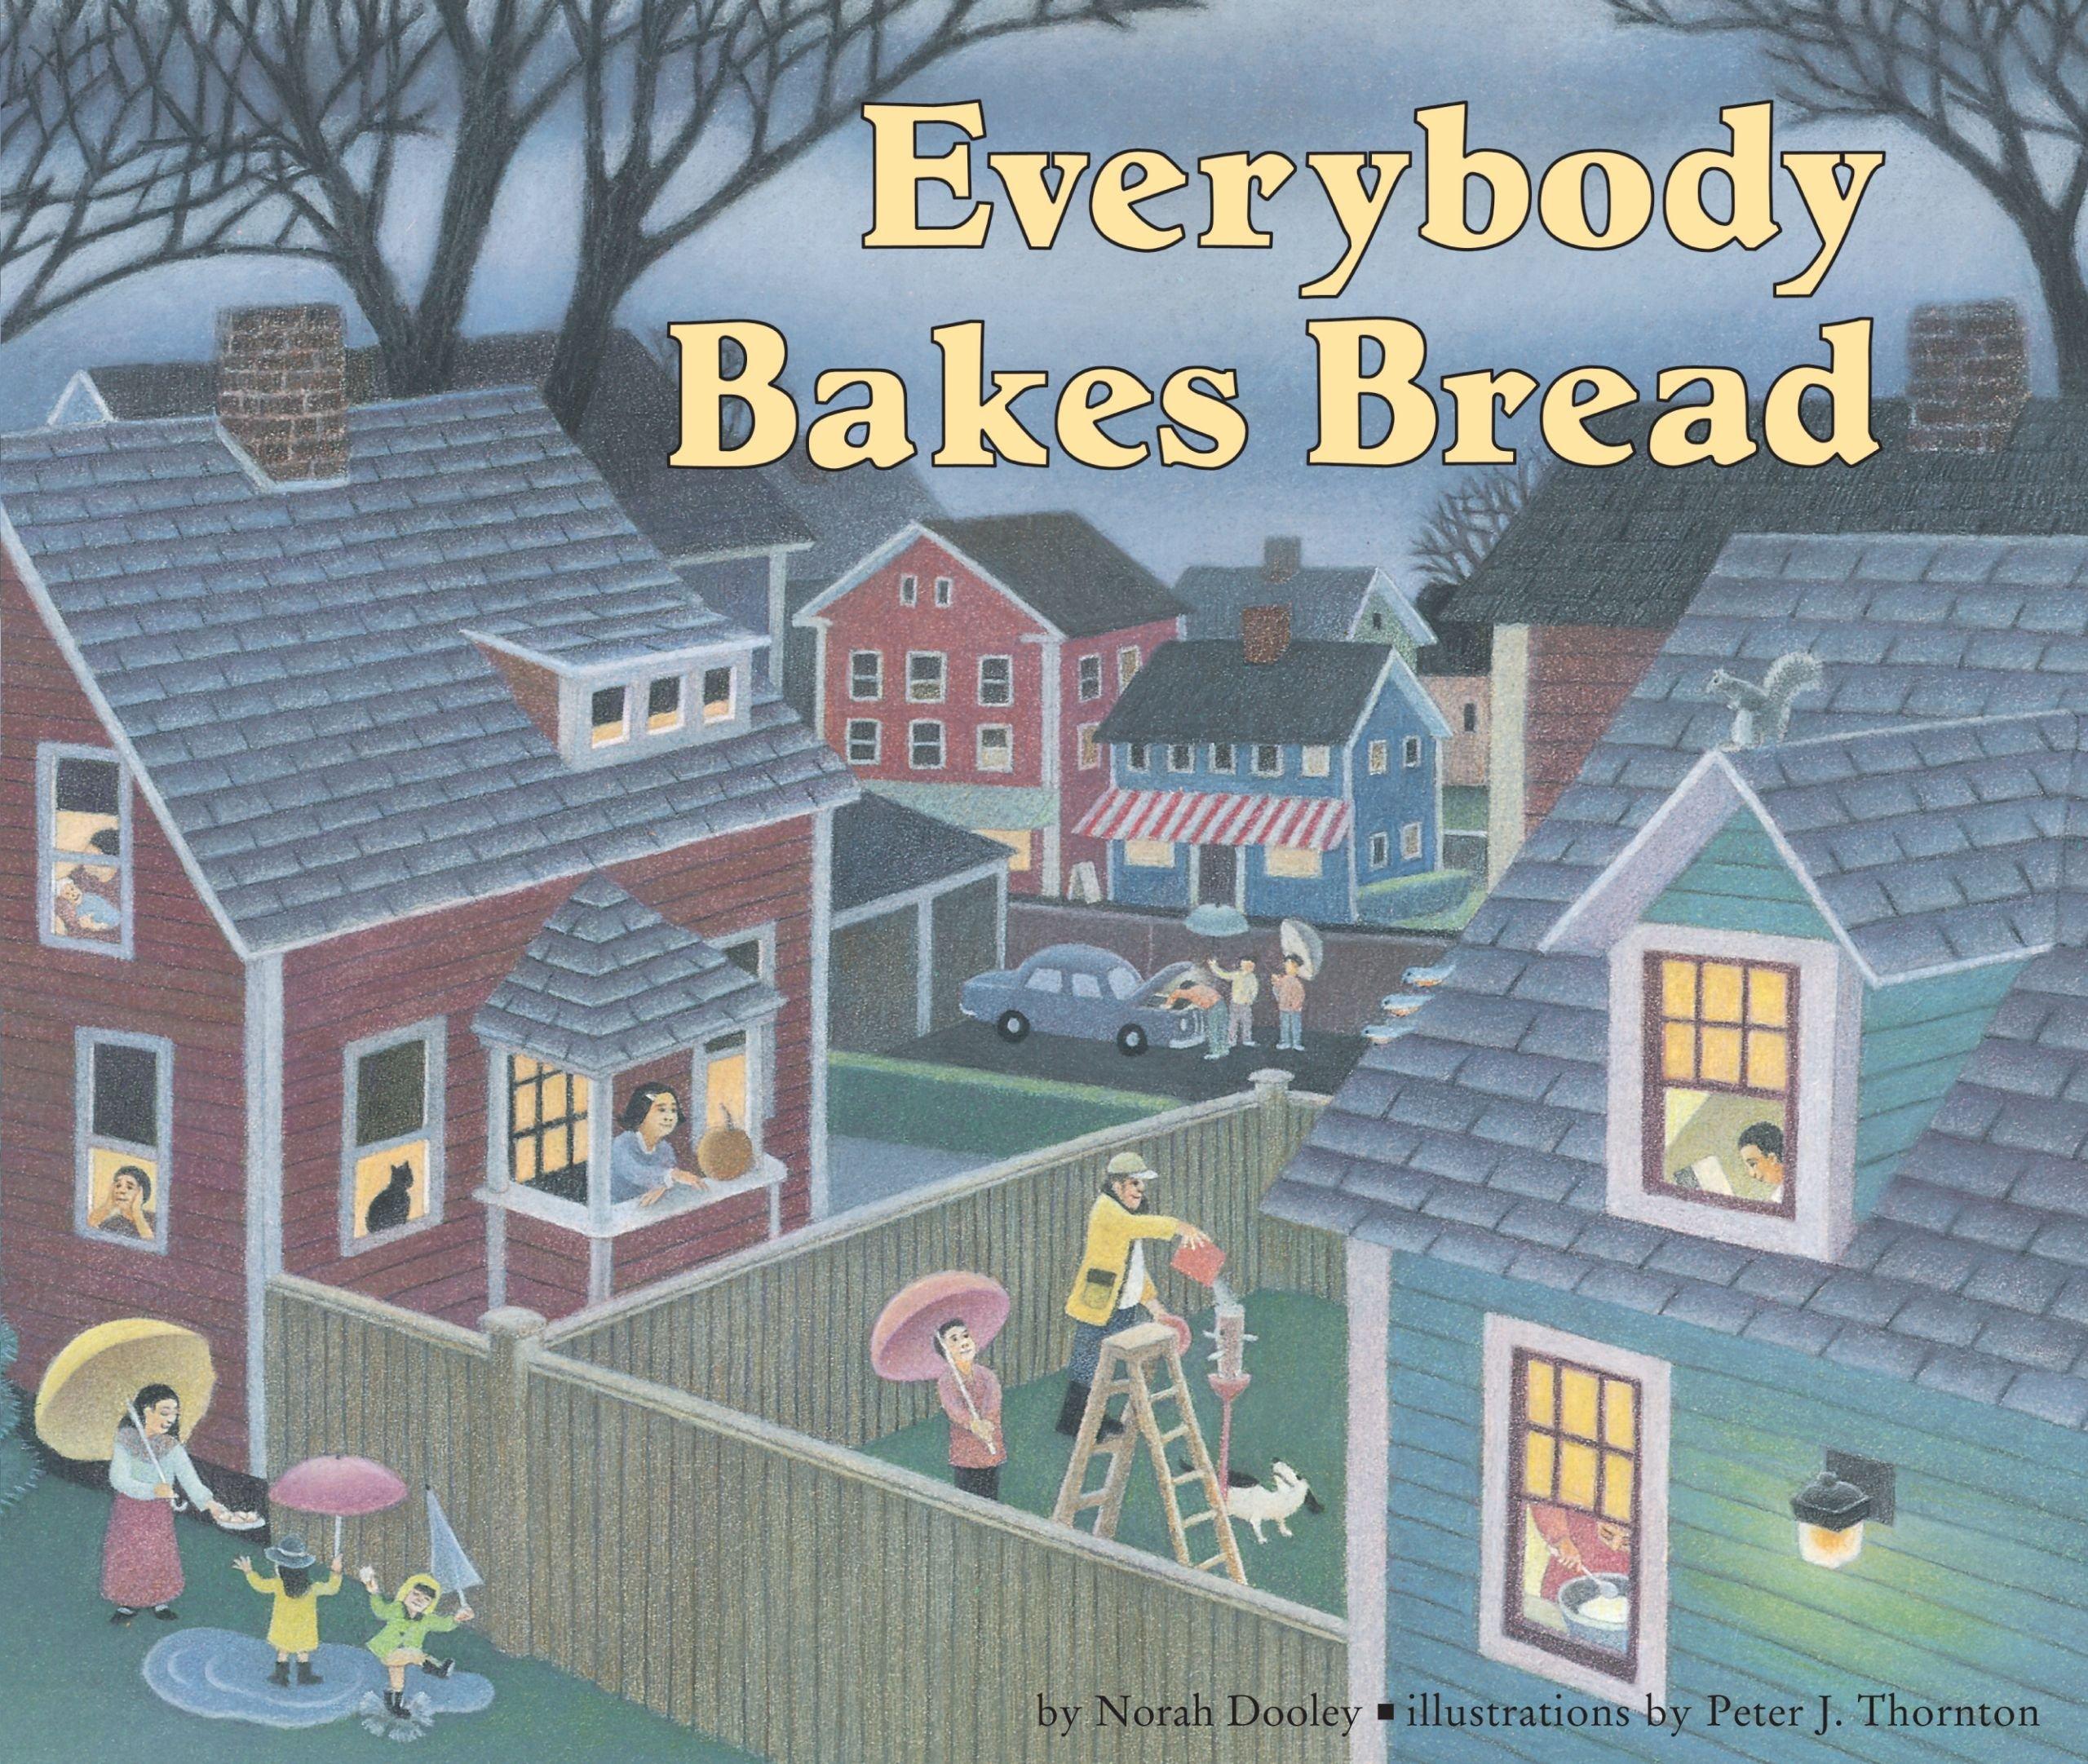 Everybody Bakes Bread (Carolrhoda Picture Books) Paperback – December 1, 1995 Norah Dooley Peter J. Thornton Carolrhoda Books 087614895X